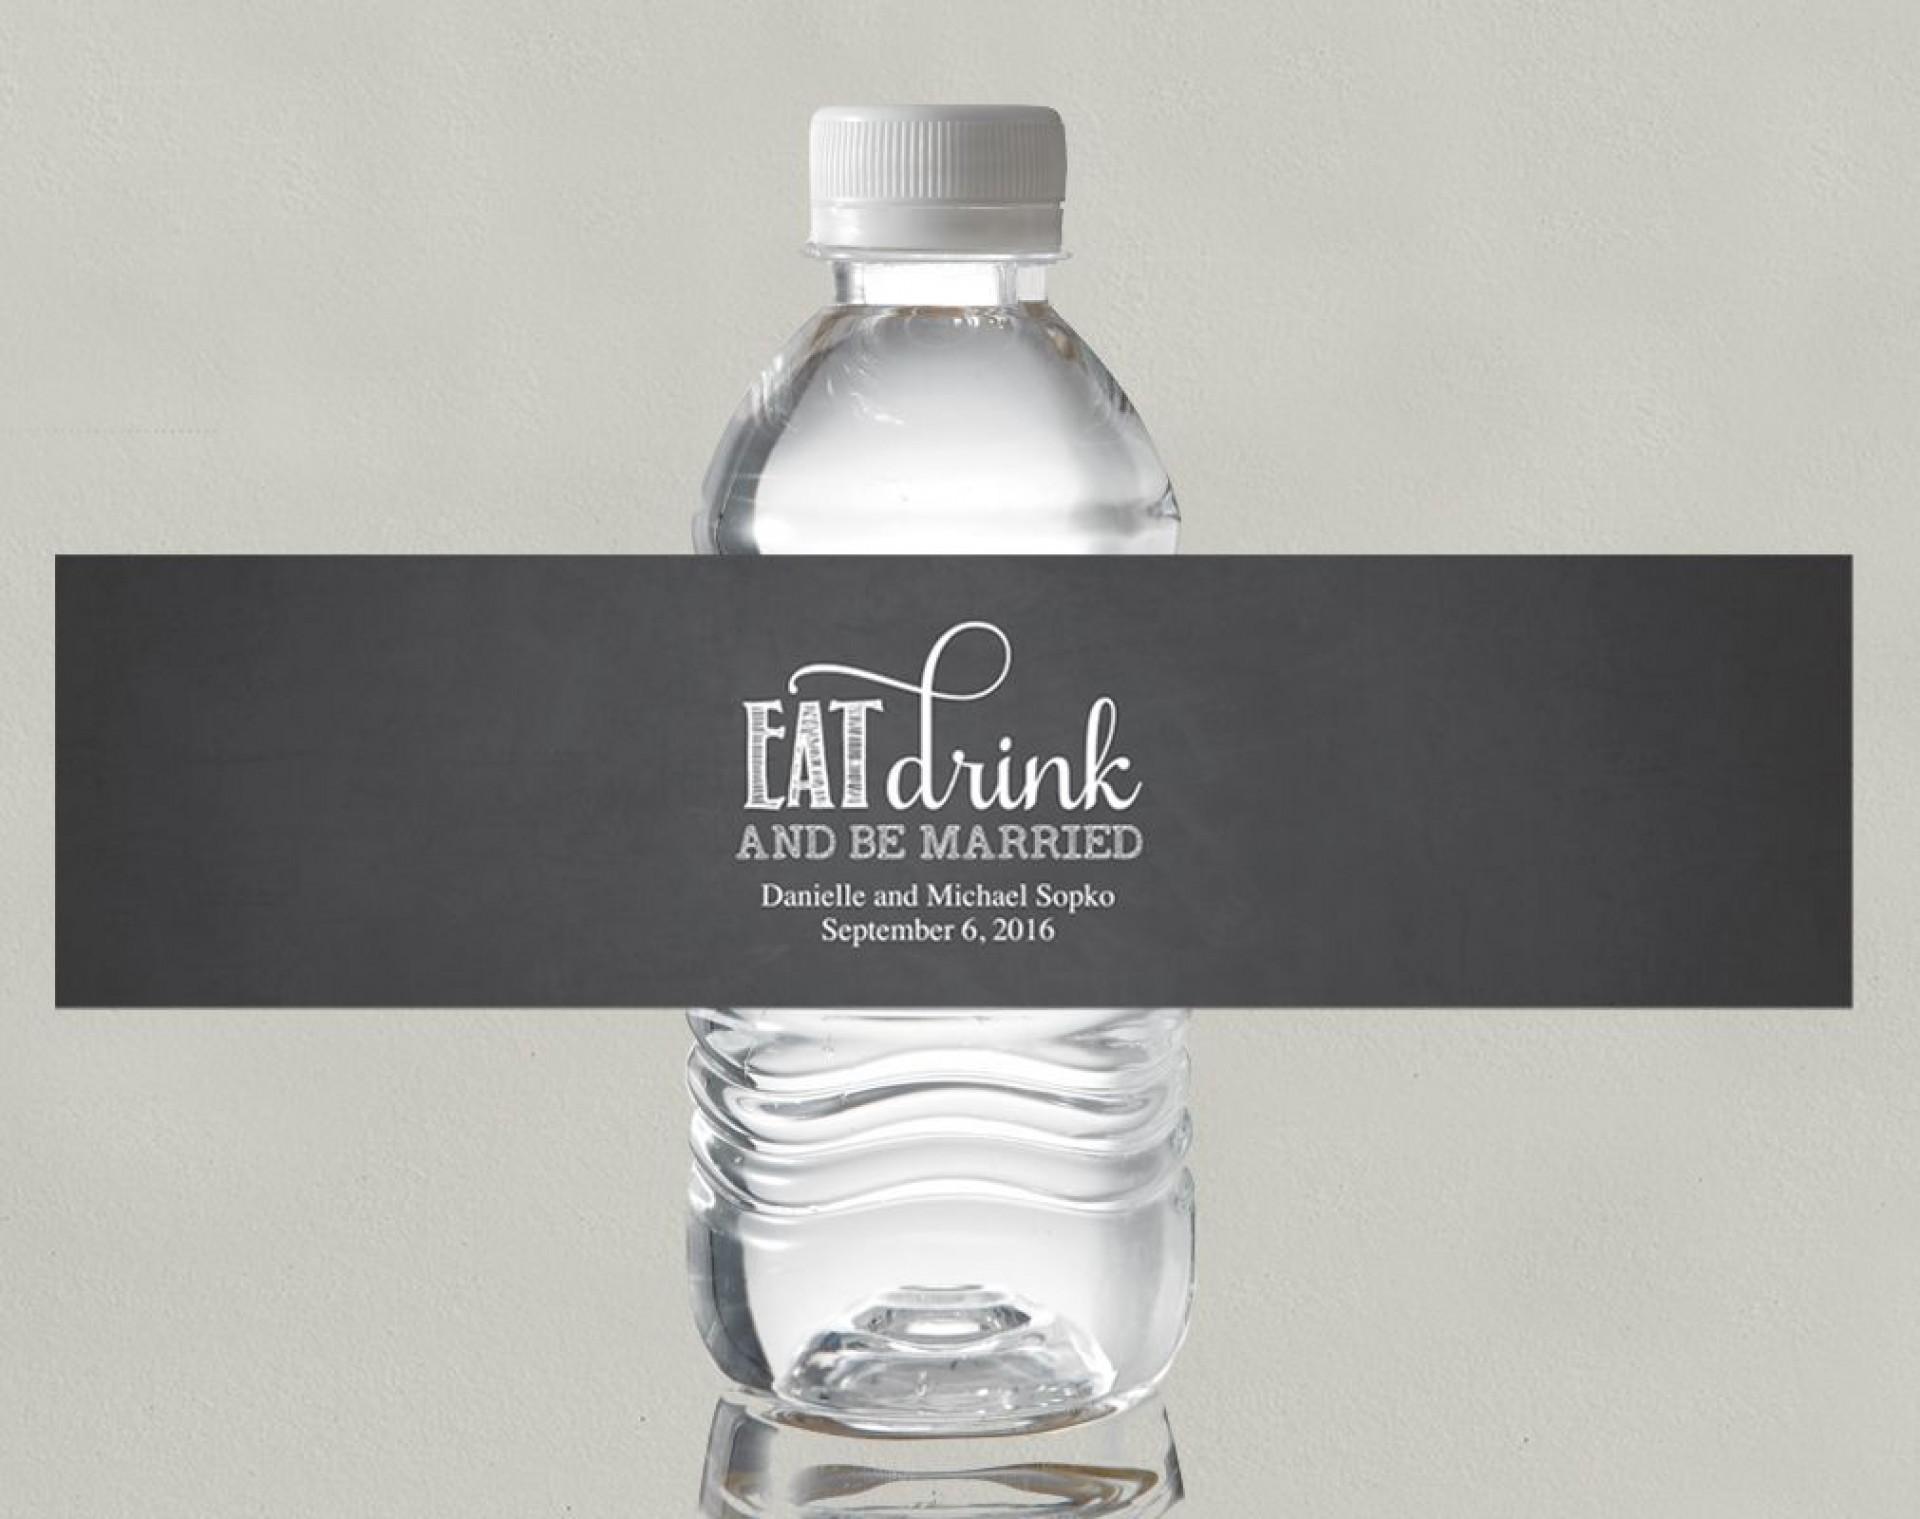 001 Singular Free Wedding Template For Word Water Bottle Label Inspiration  Labels1920